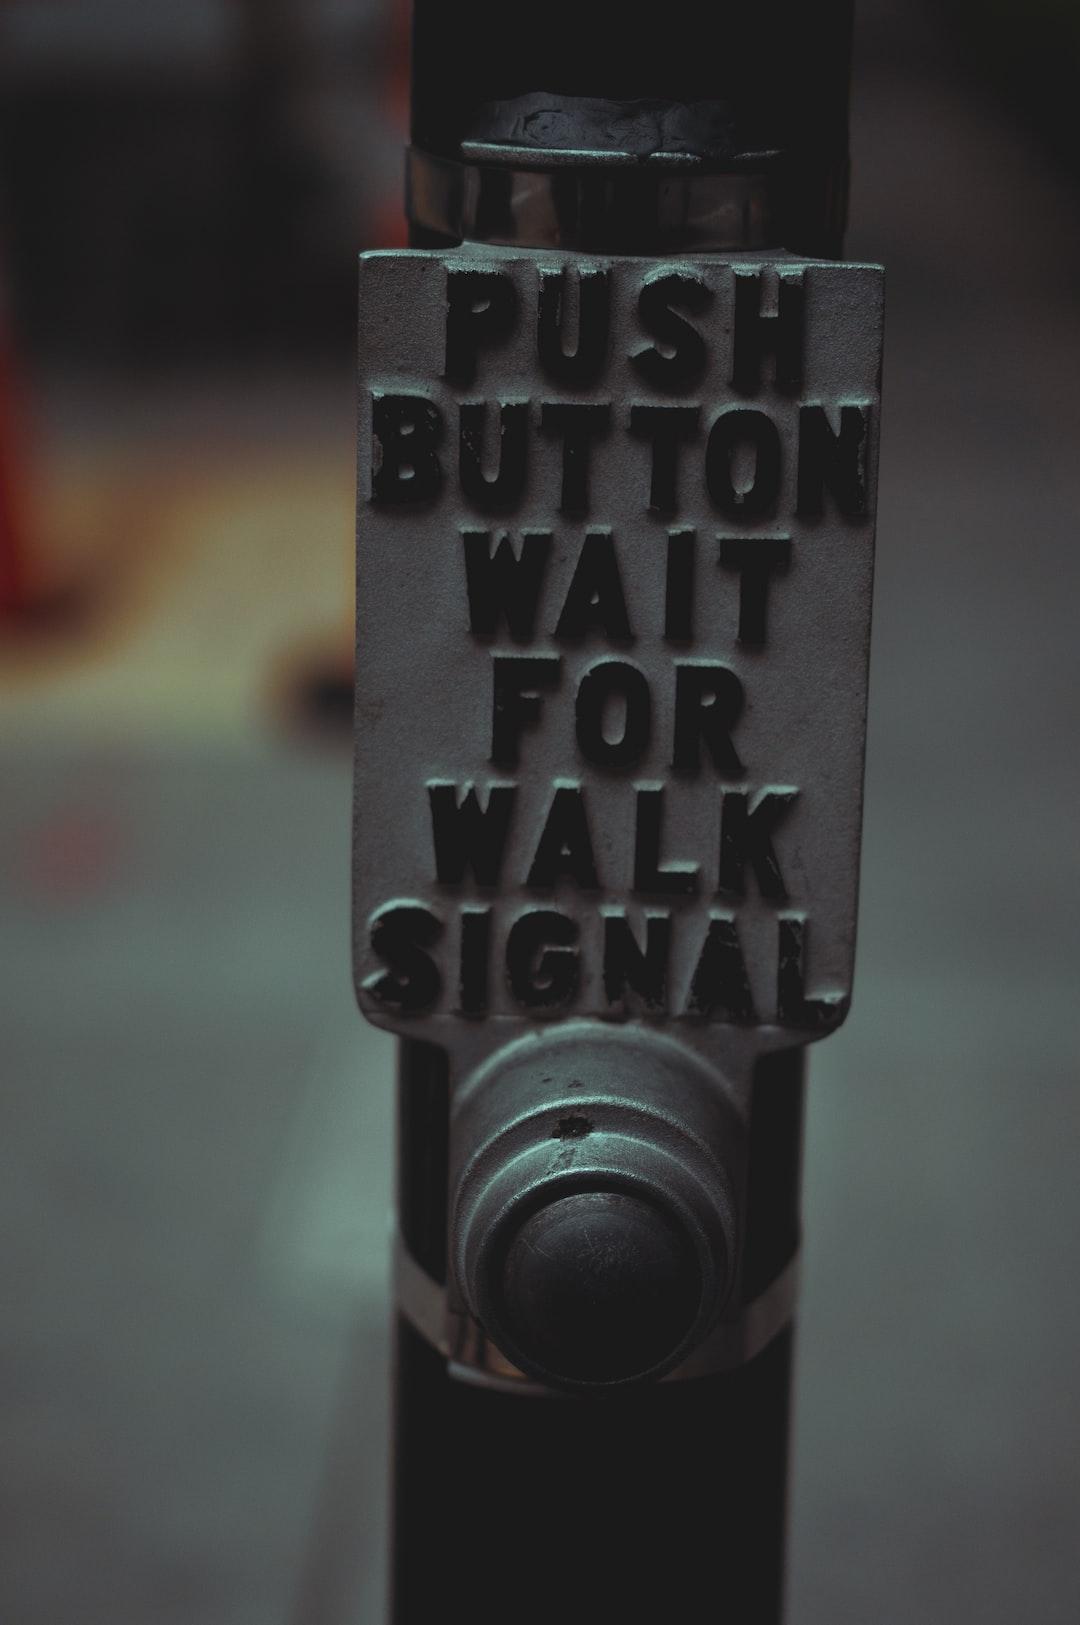 Push button wait for walk signal